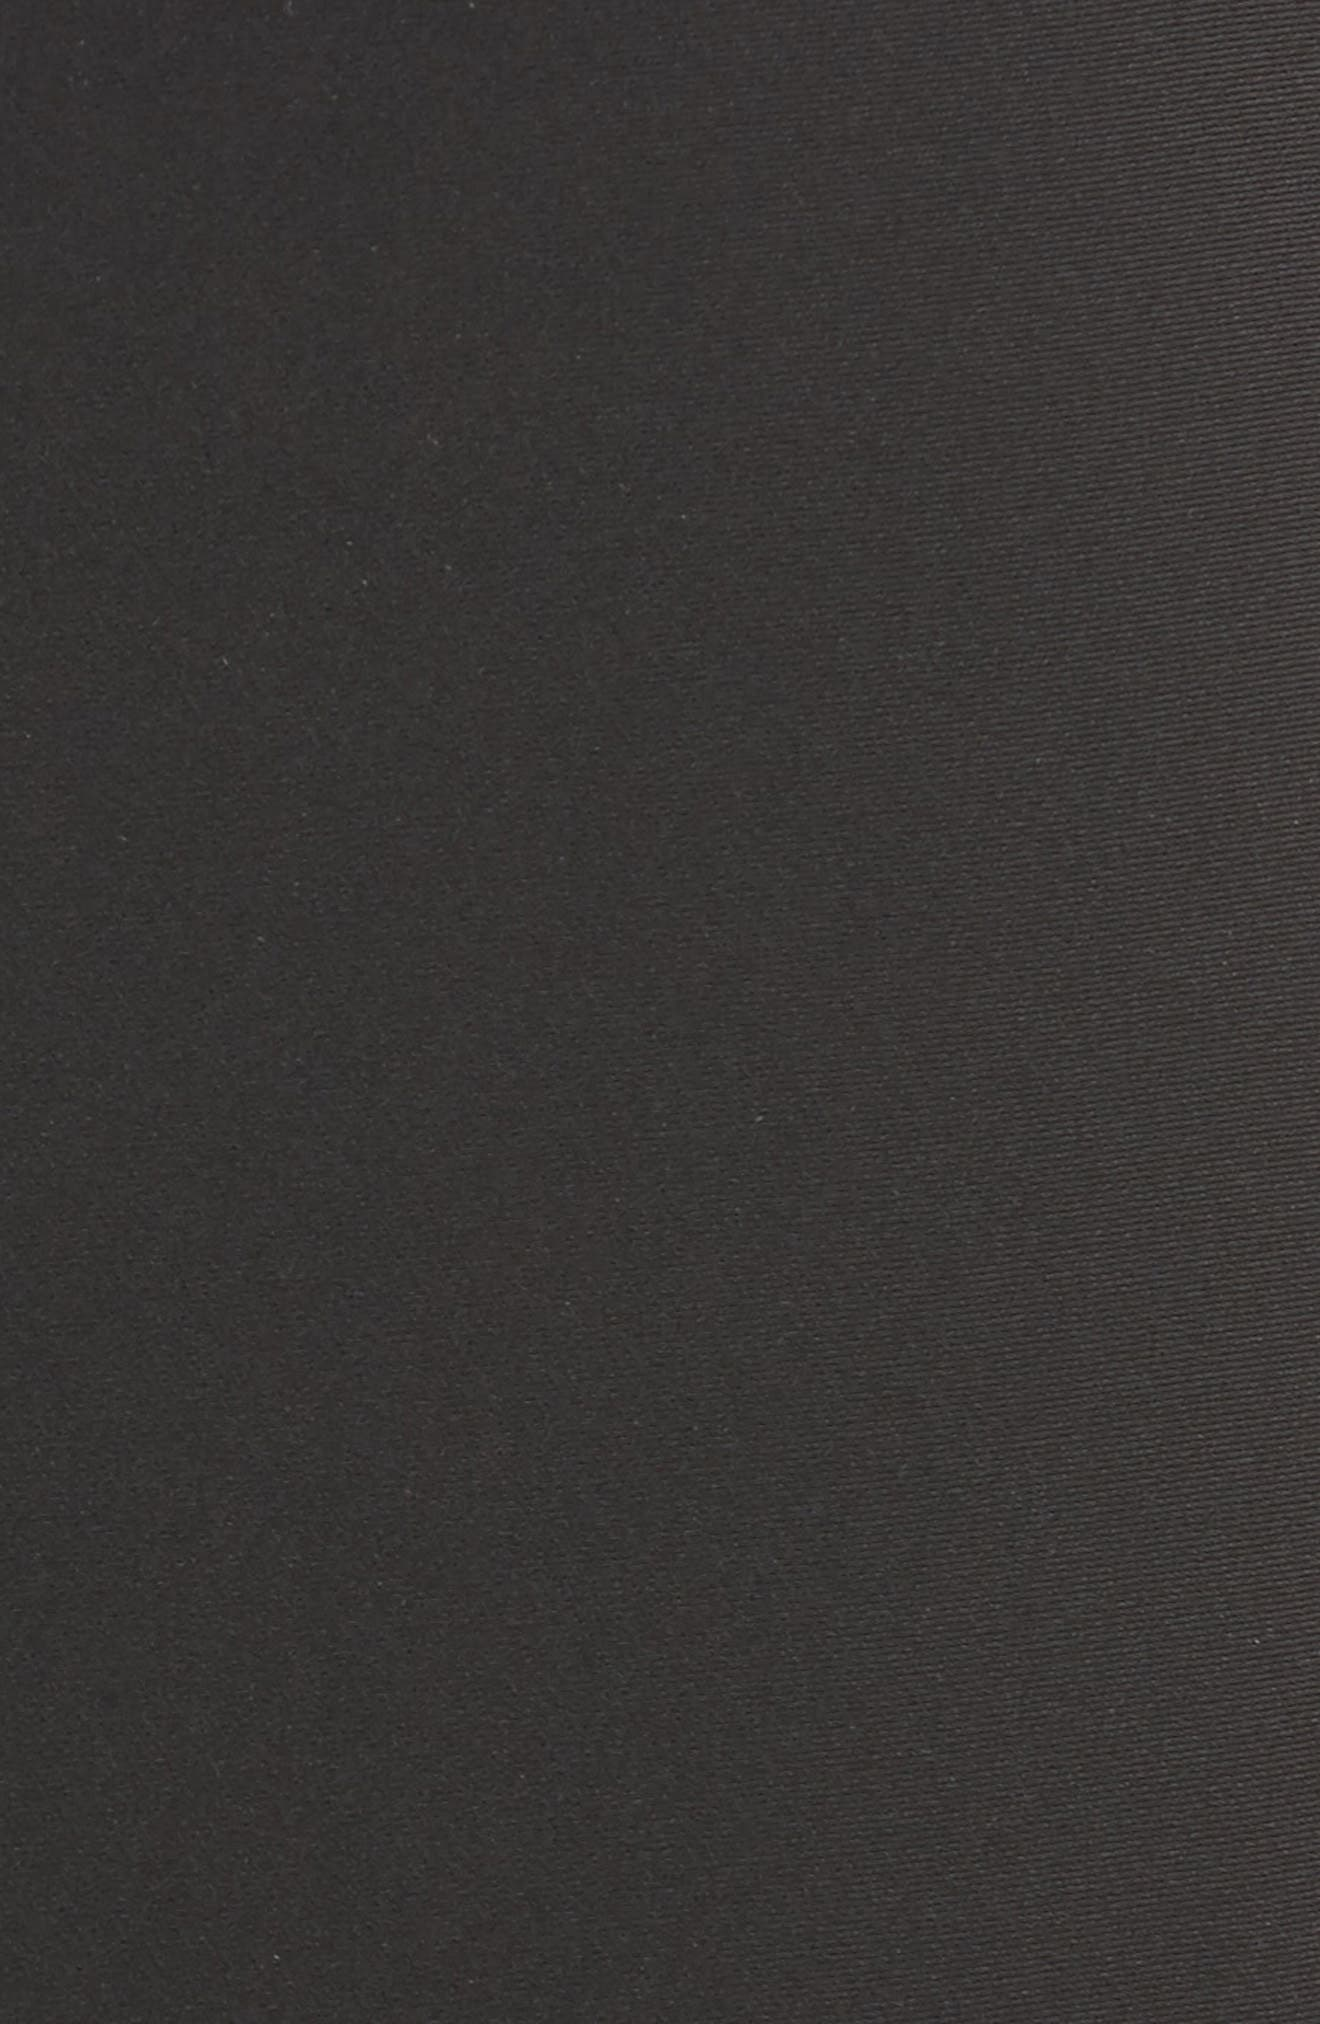 Crepe Marocain Pencil Skirt,                             Alternate thumbnail 6, color,                             CAVIAR